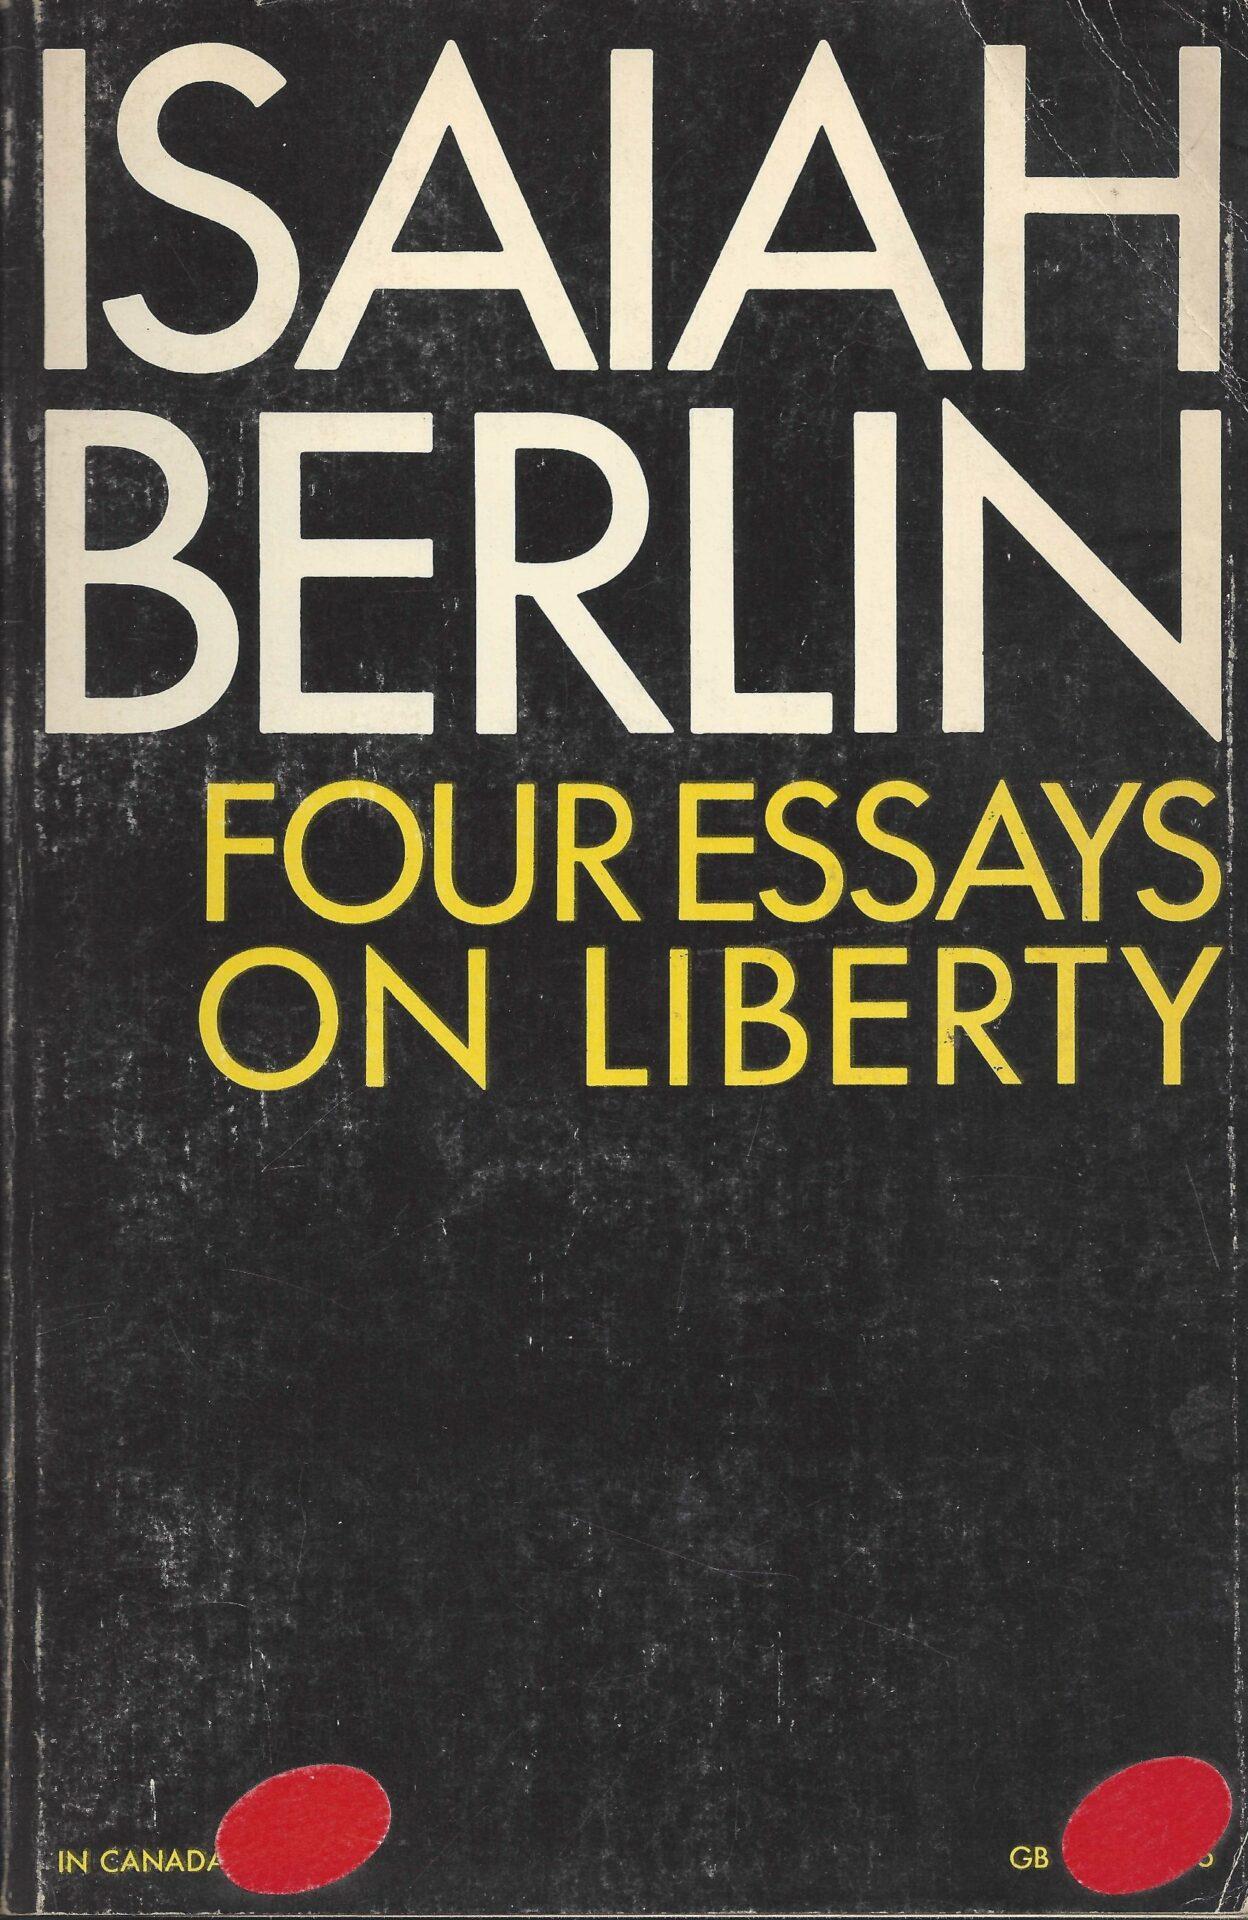 On Liberty Essay